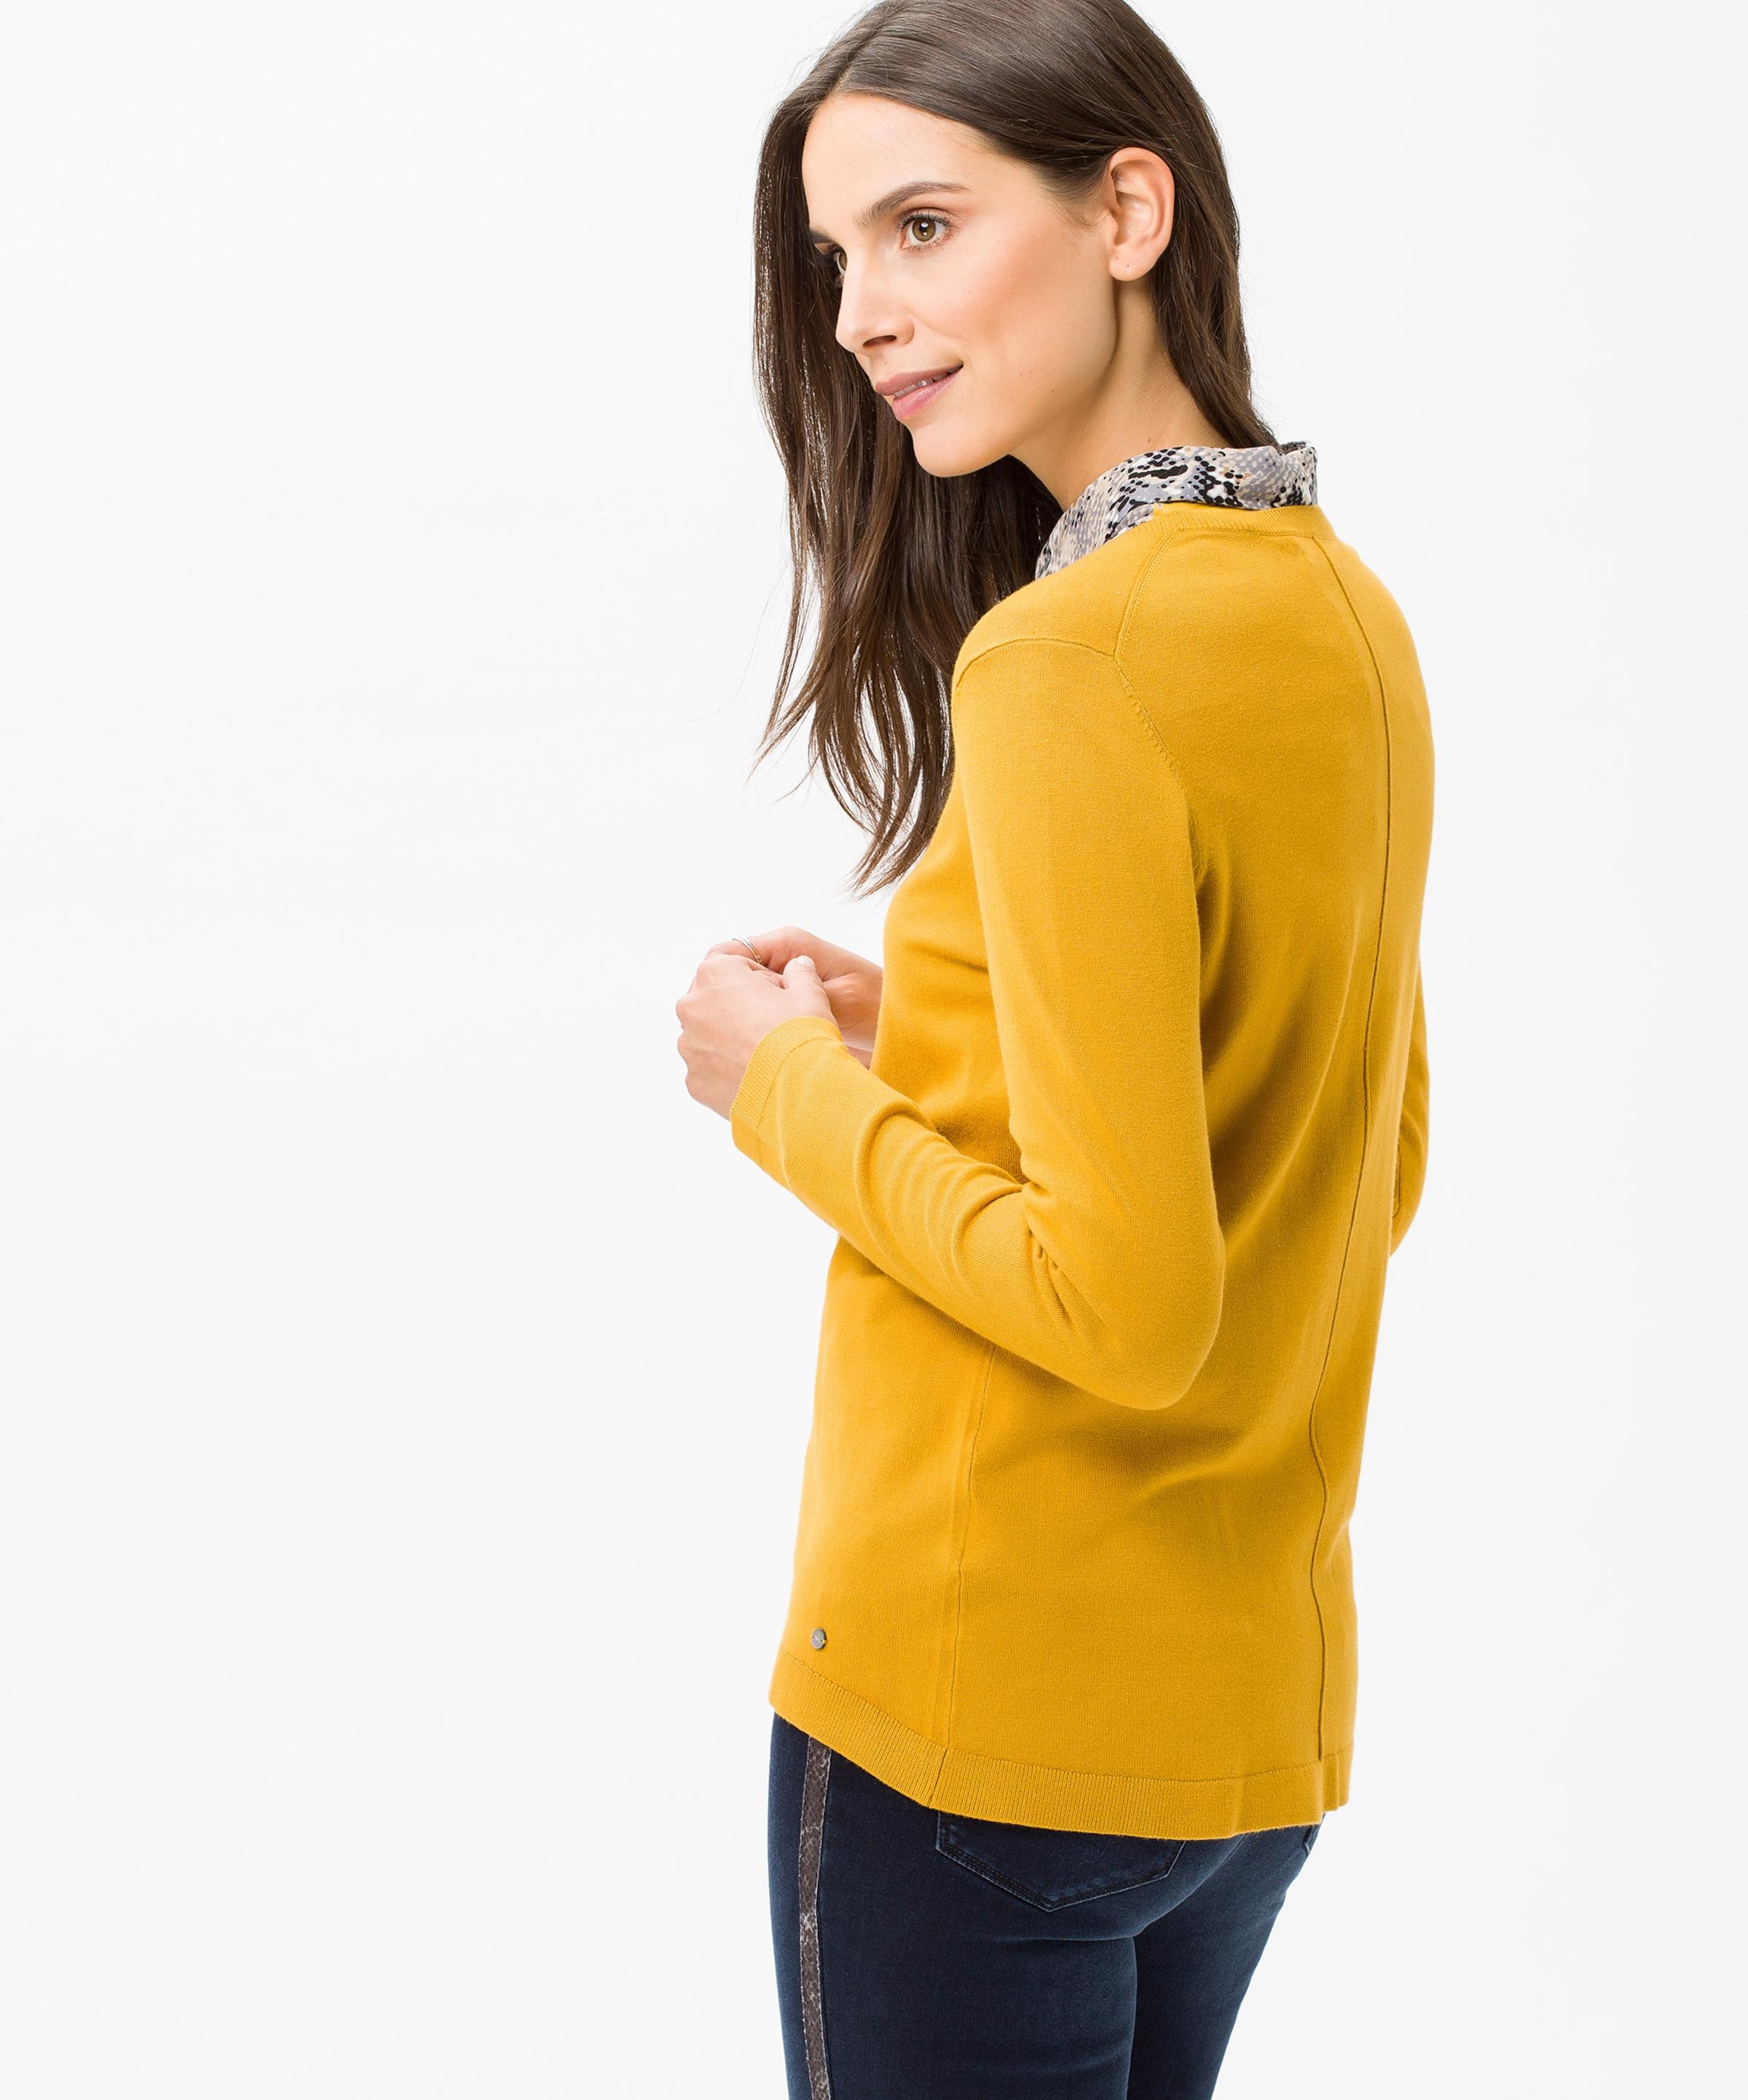 Brax In Pullover 'liz' 'liz' Pullover Gelb In Brax rxoCWdBe